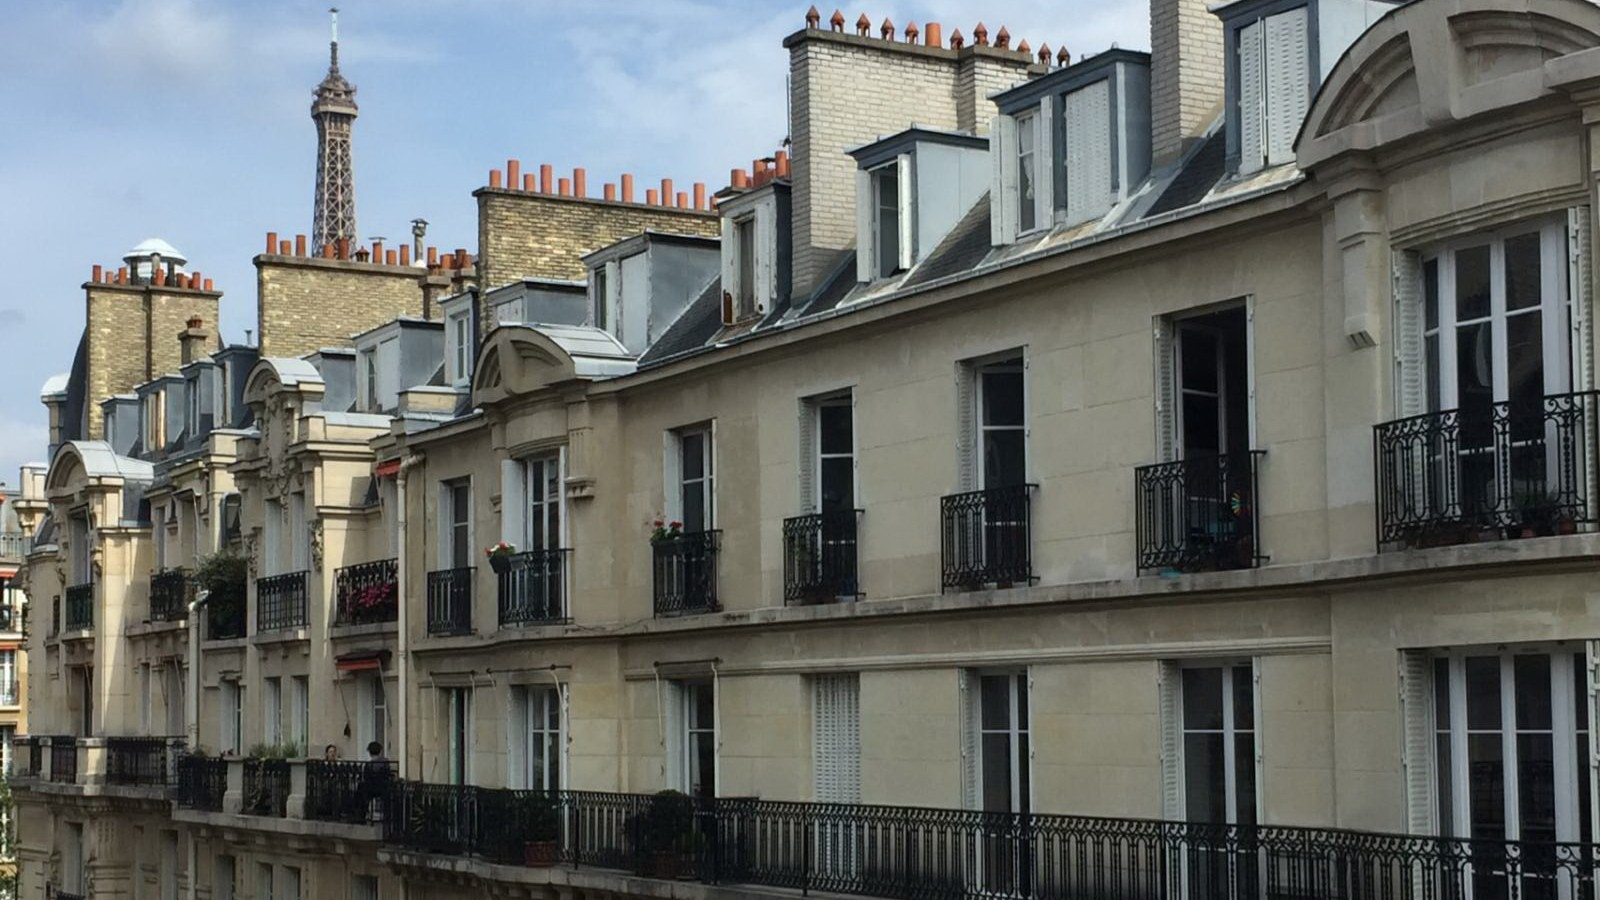 Paris: Home sweet home, at last